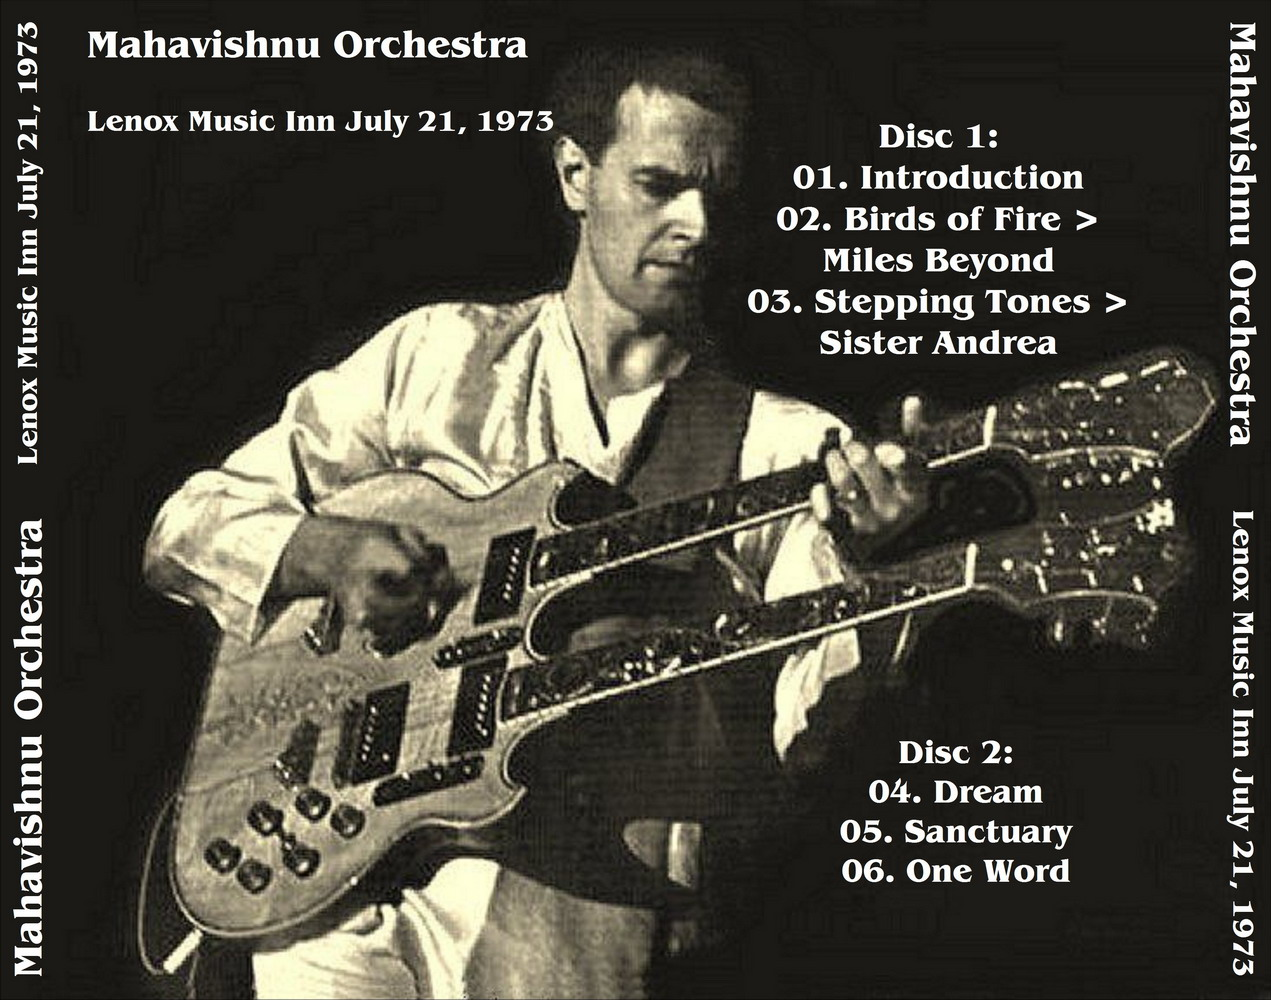 Mahavishnu Orchestra - The Flock - The Origine Of